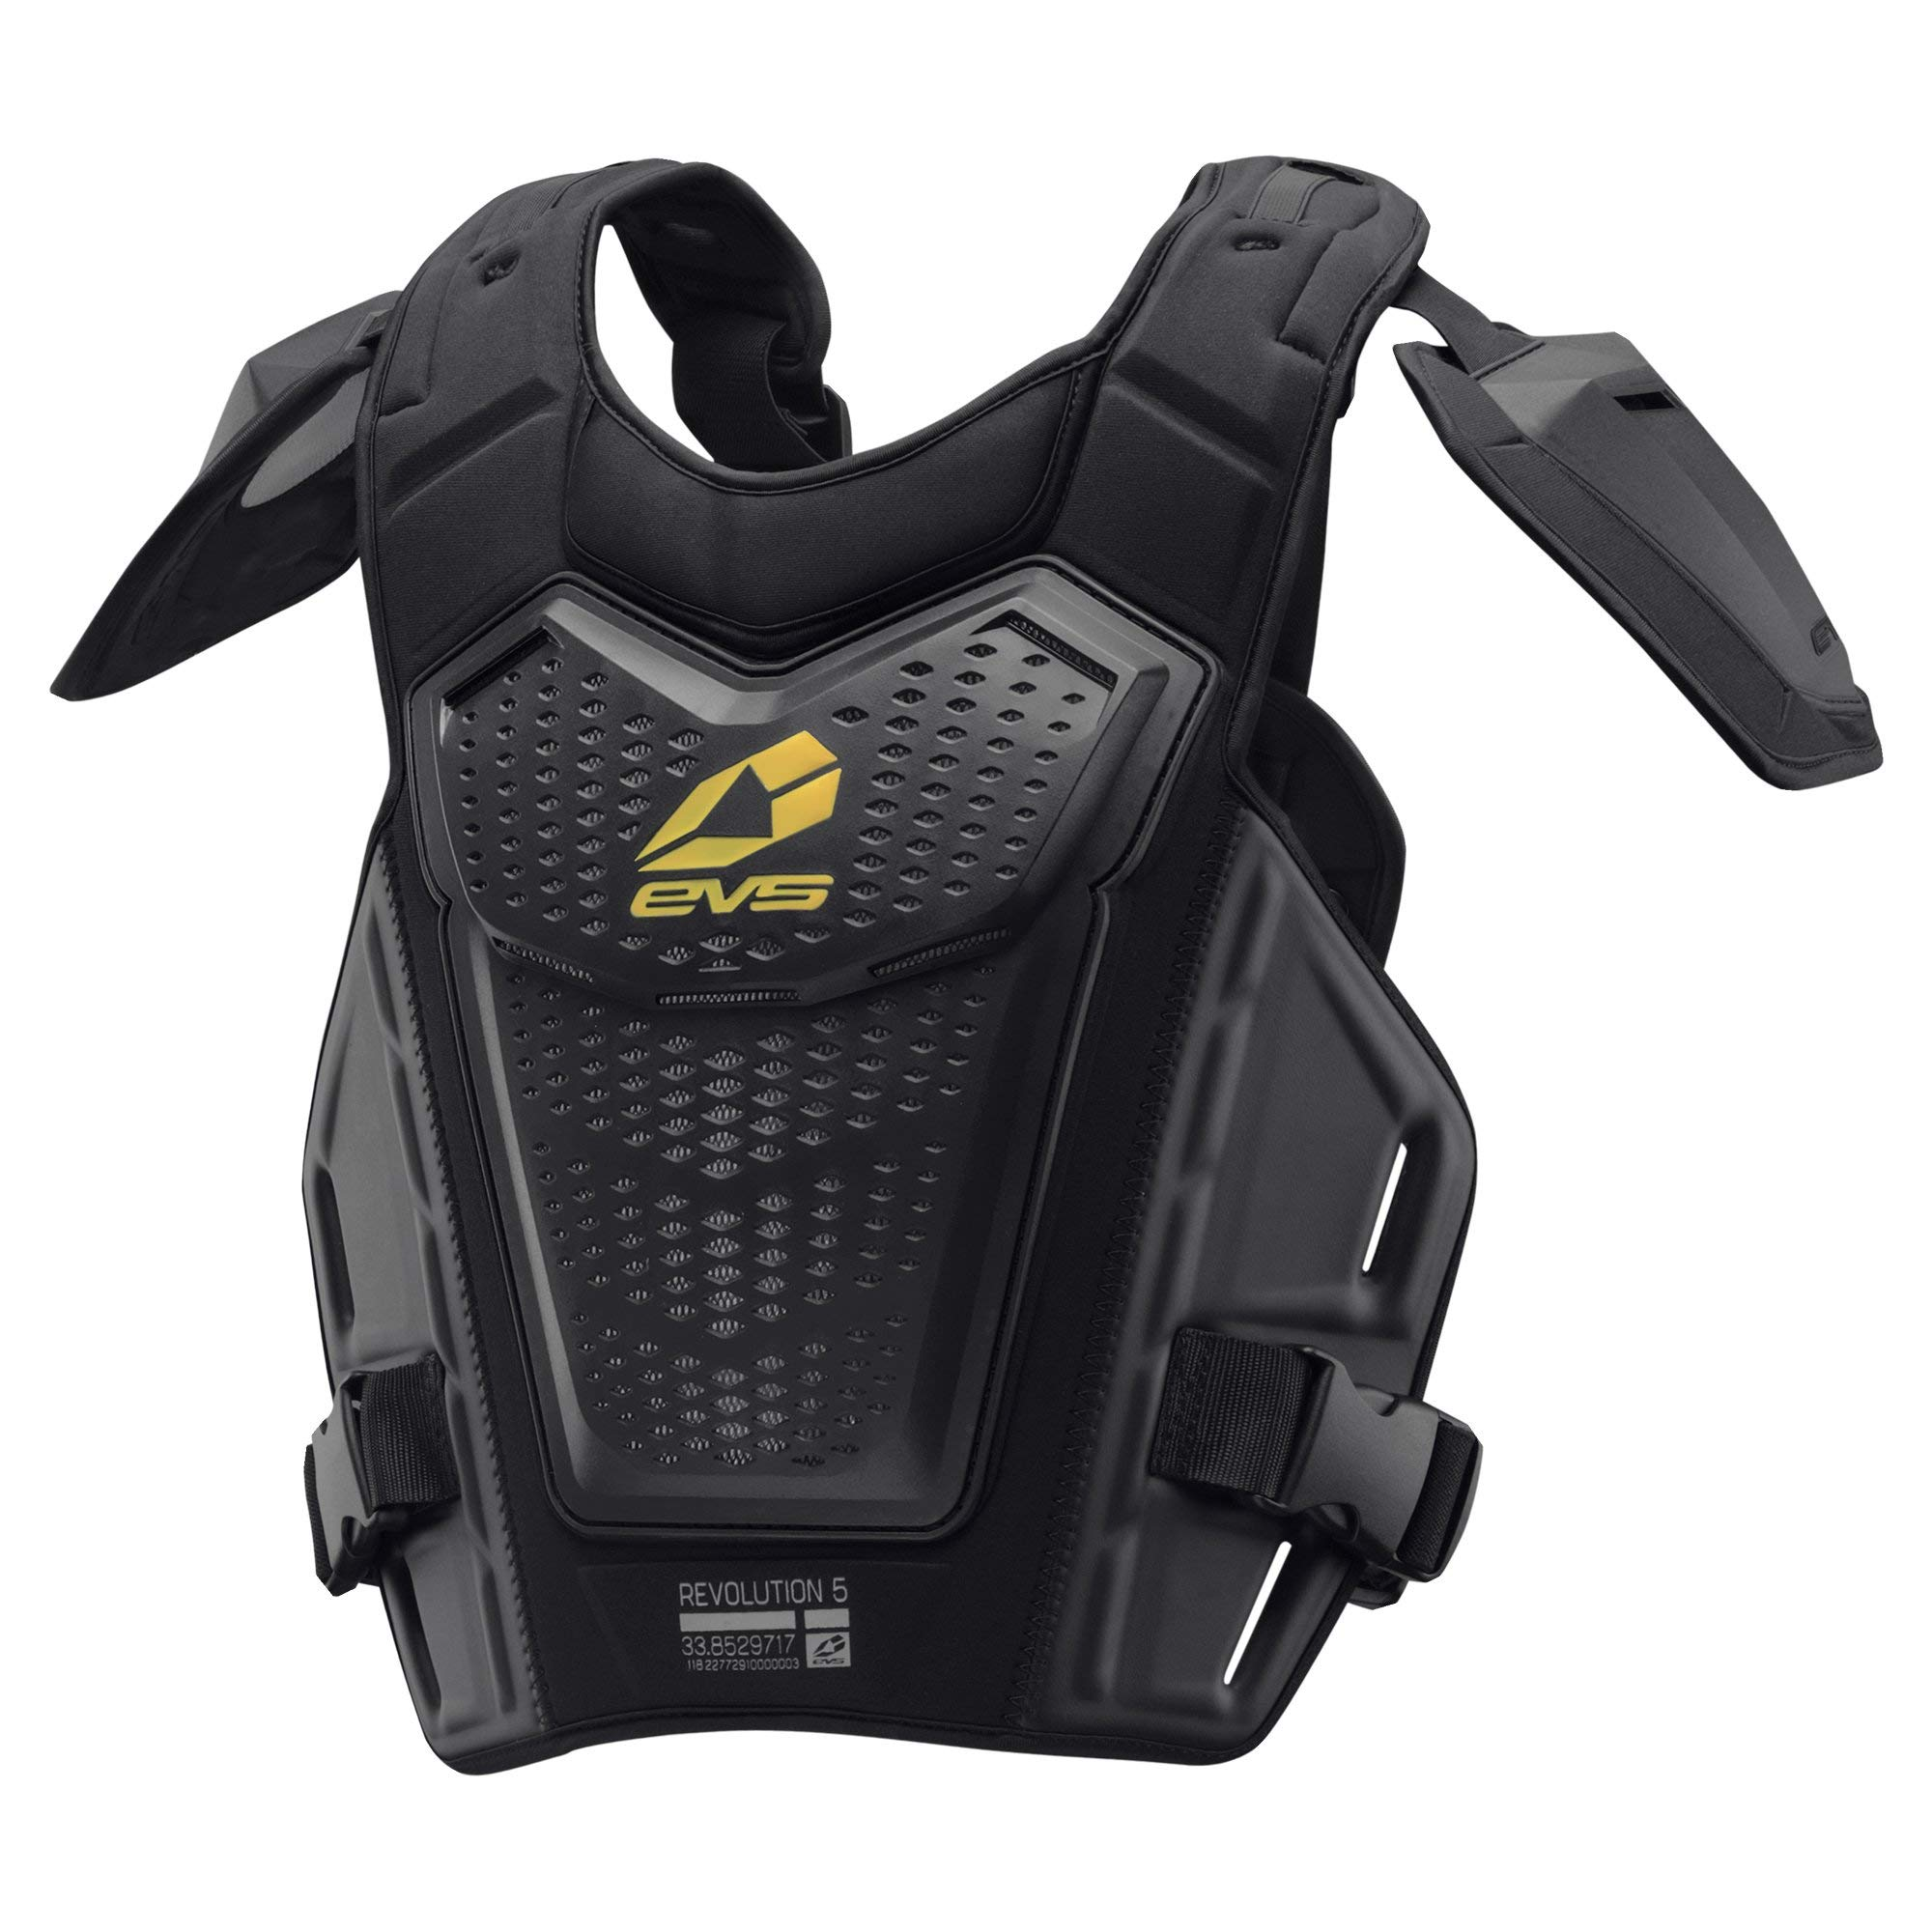 EVS Sports Men's Roost Deflector (REVO 5) (Black/Hi-Viz, Adult (L/XL)) by EVS Sports